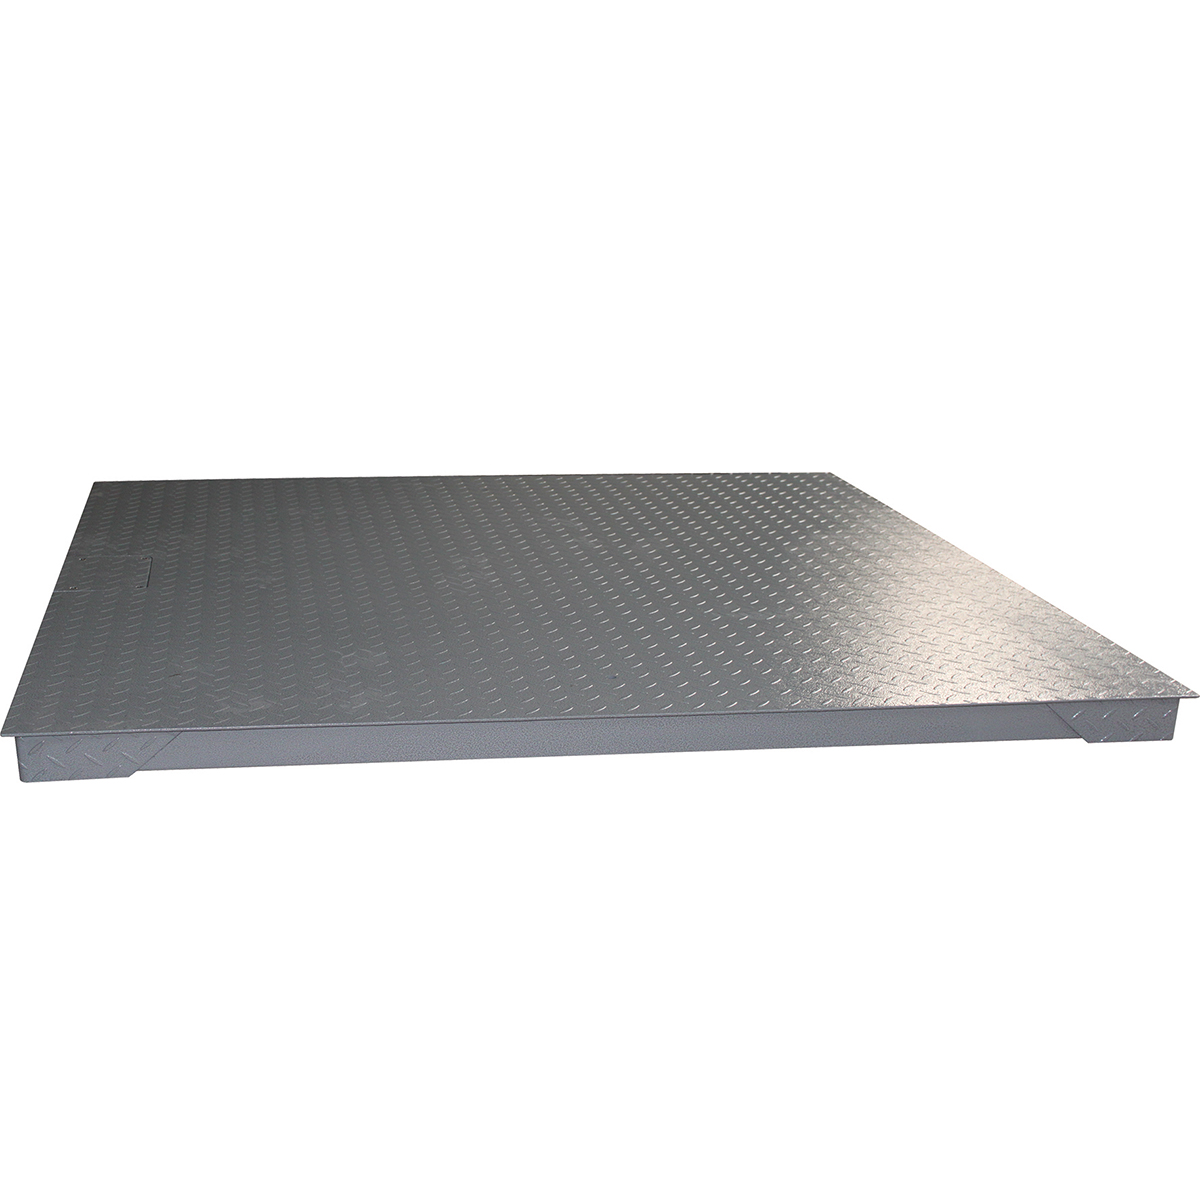 Mild Steel Platform Scale